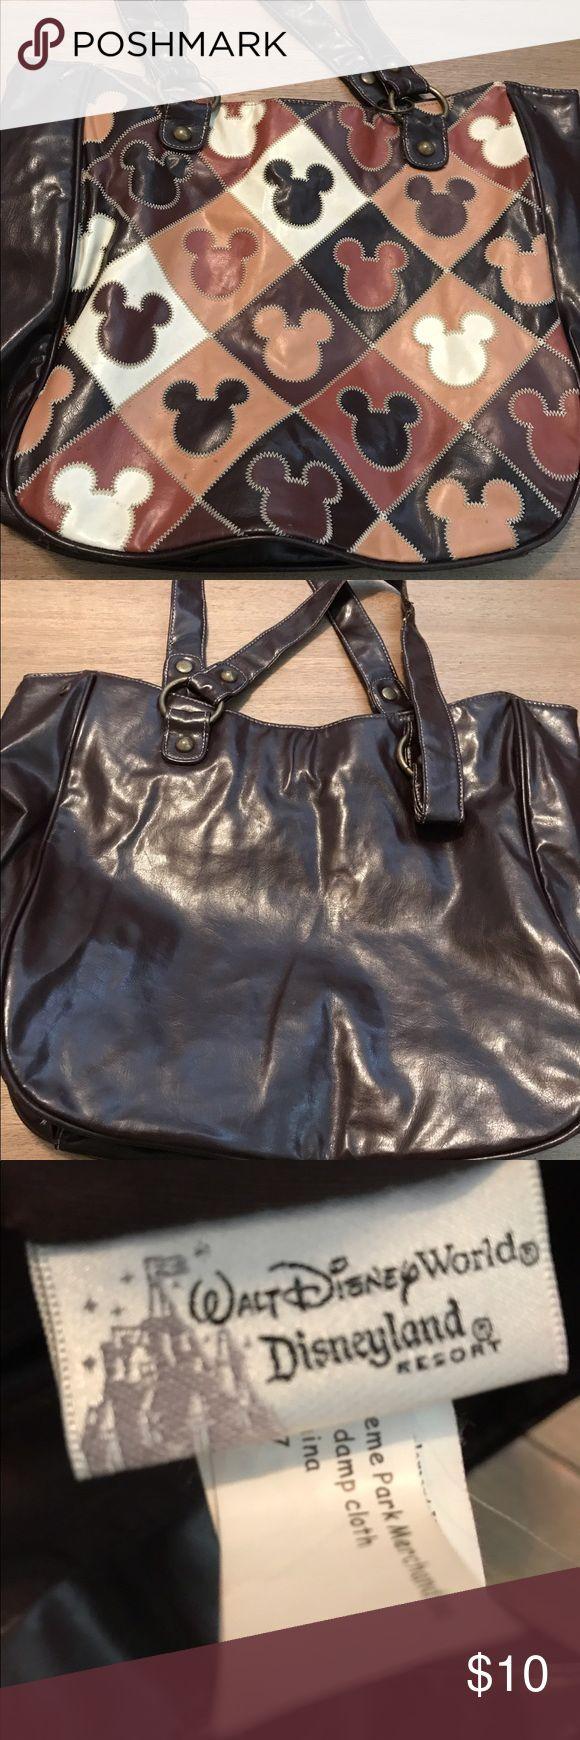 Walt Disney theme bag! Great condition, medium sized bag! walt disney world Bags Shoulder Bags